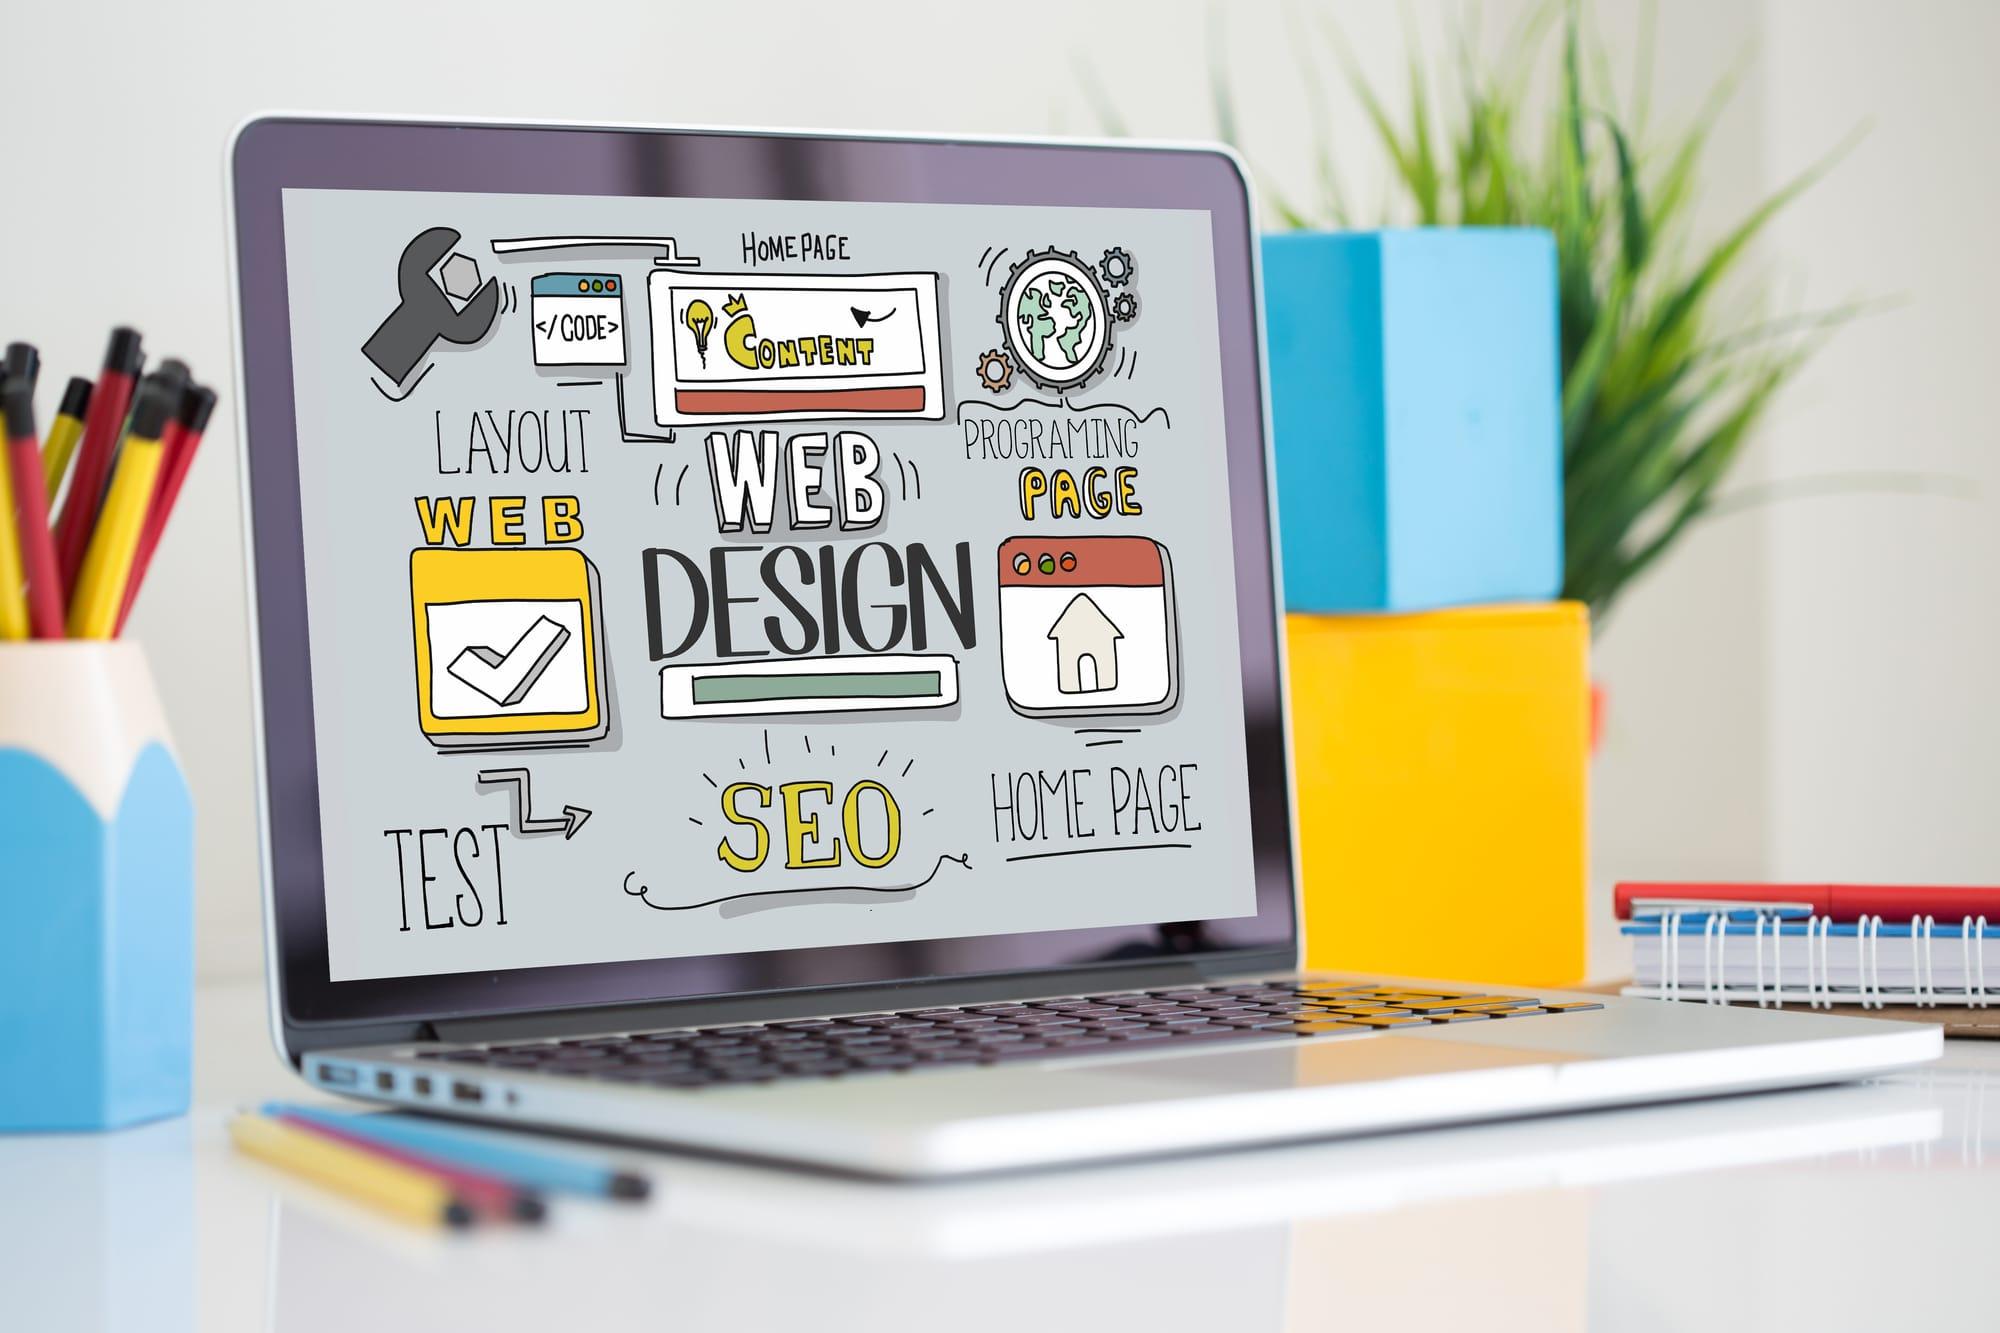 New Orleans Web Design - Big Easy SEO